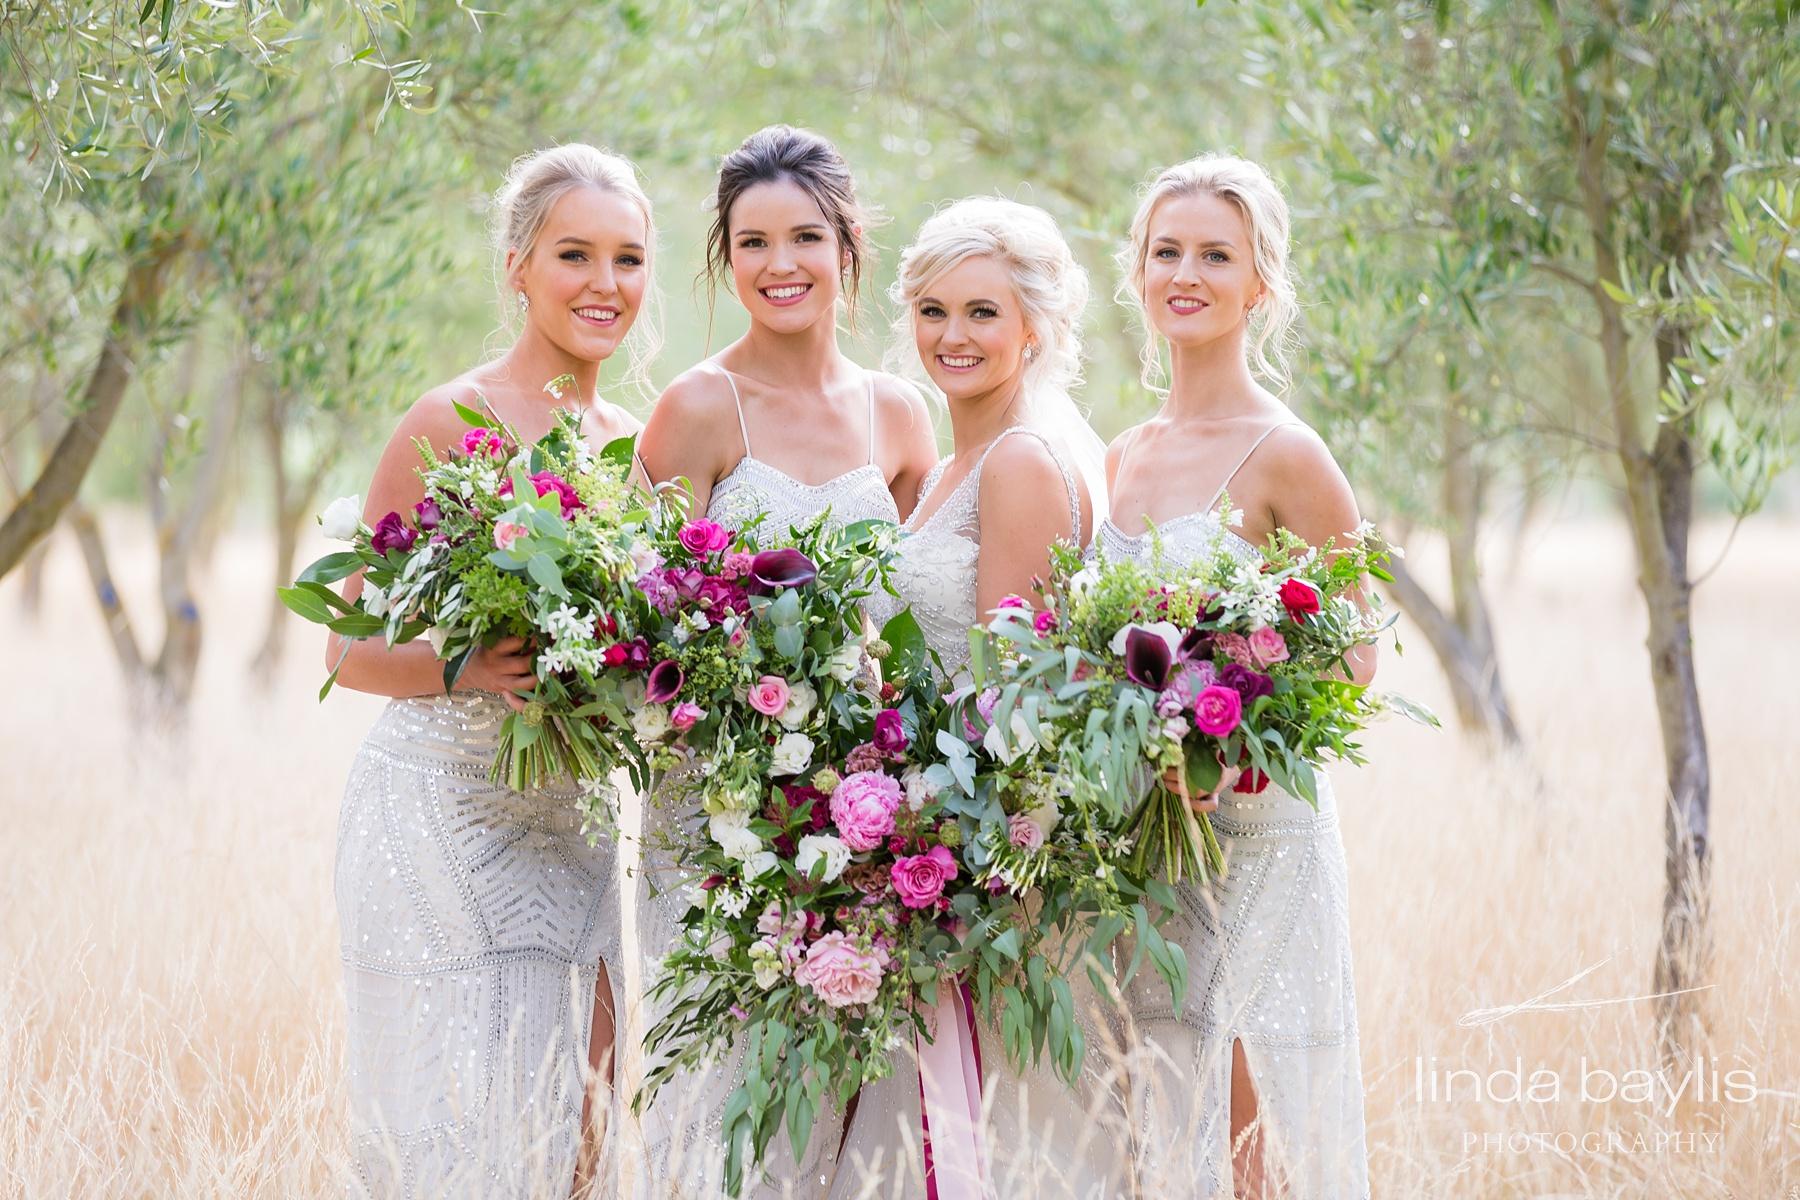 hawkes-bay-wedding-te-awa-linda-baylis-photography_0616 (2017_09_03 06_58_33 UTC).jpg